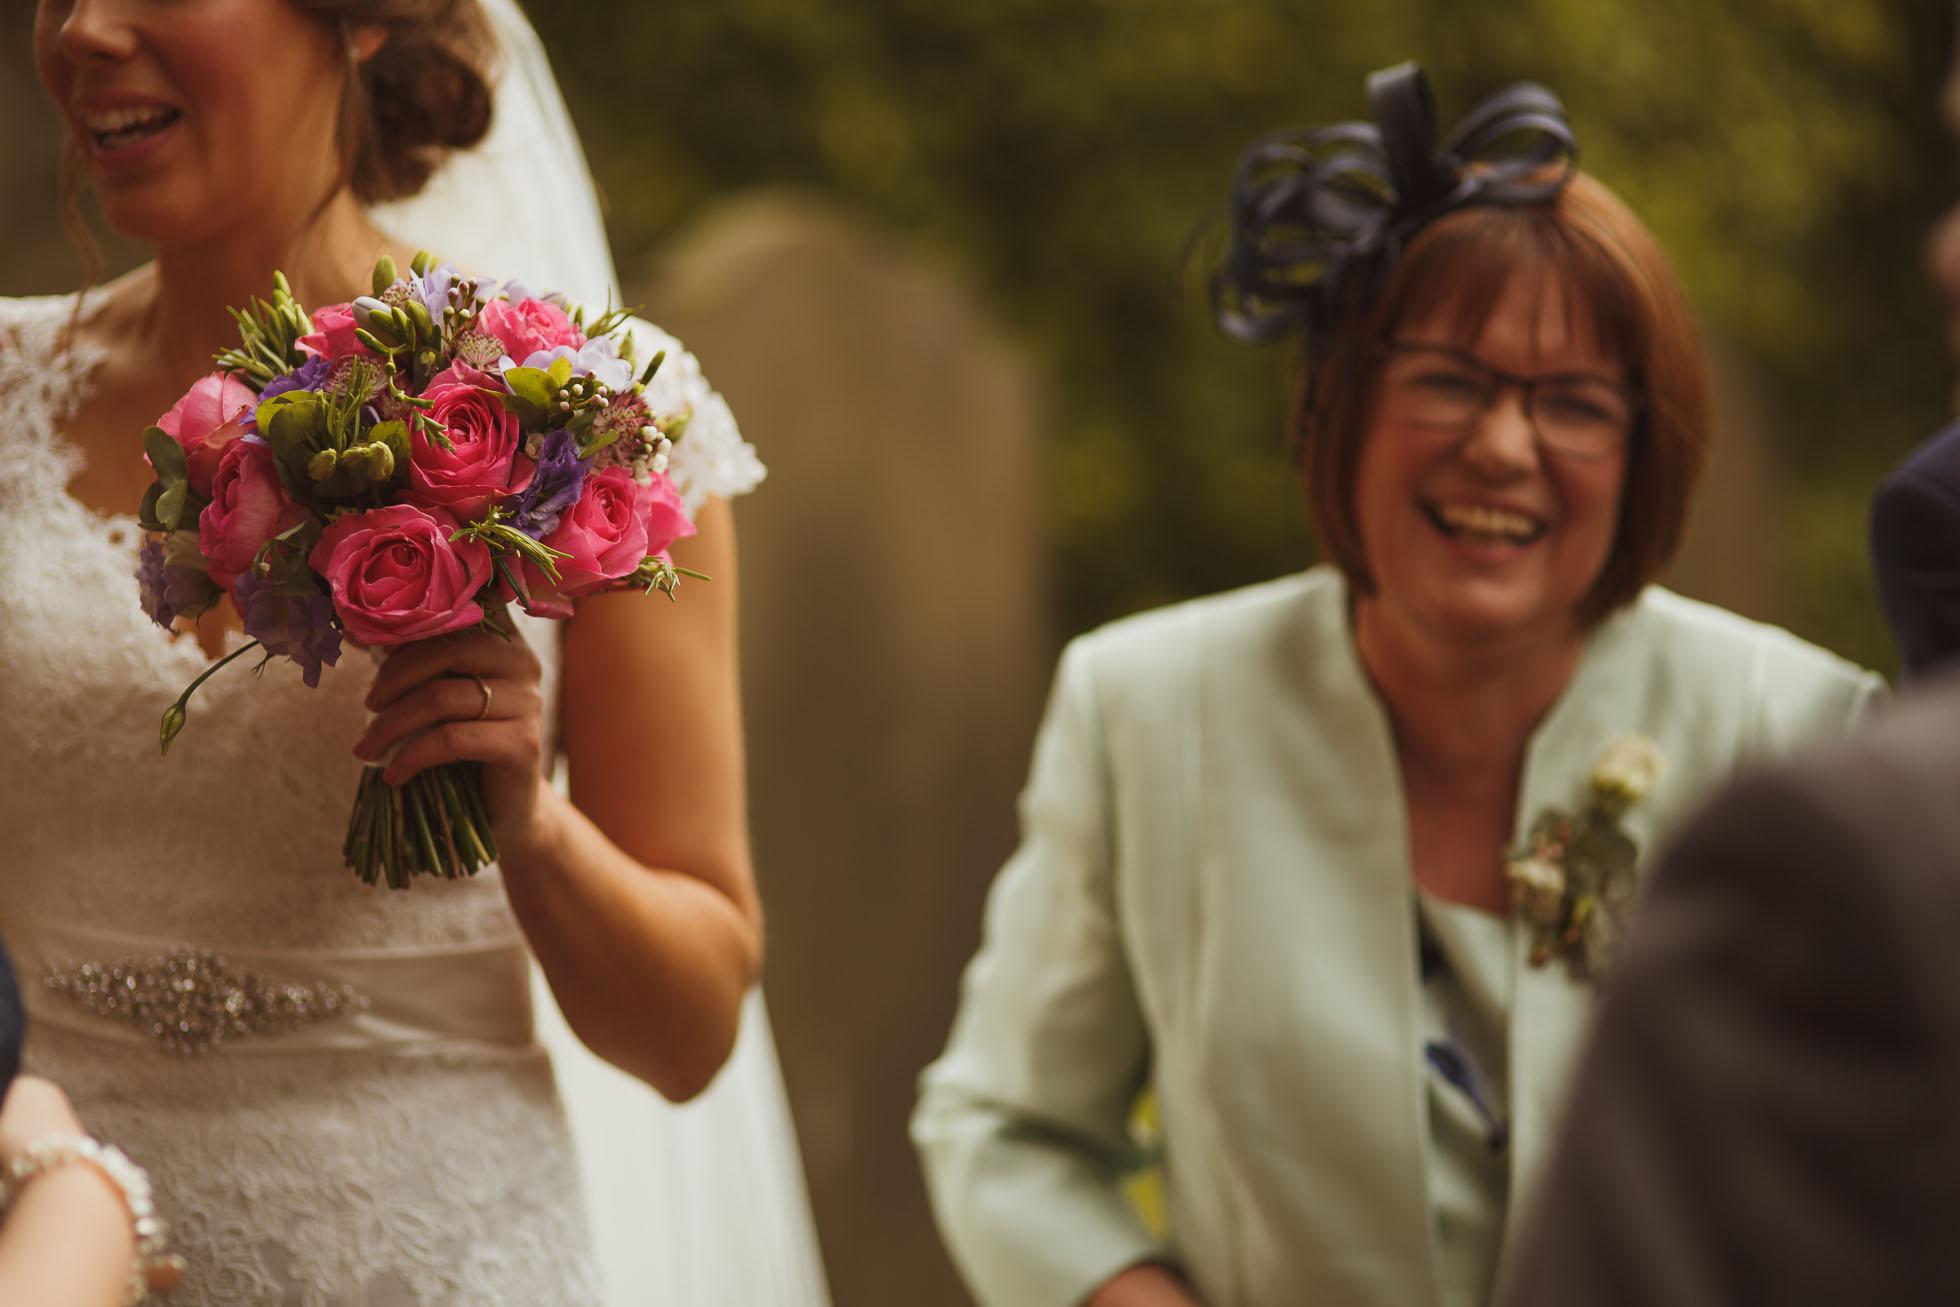 denton-hall-wedding-photographer-33.jpg